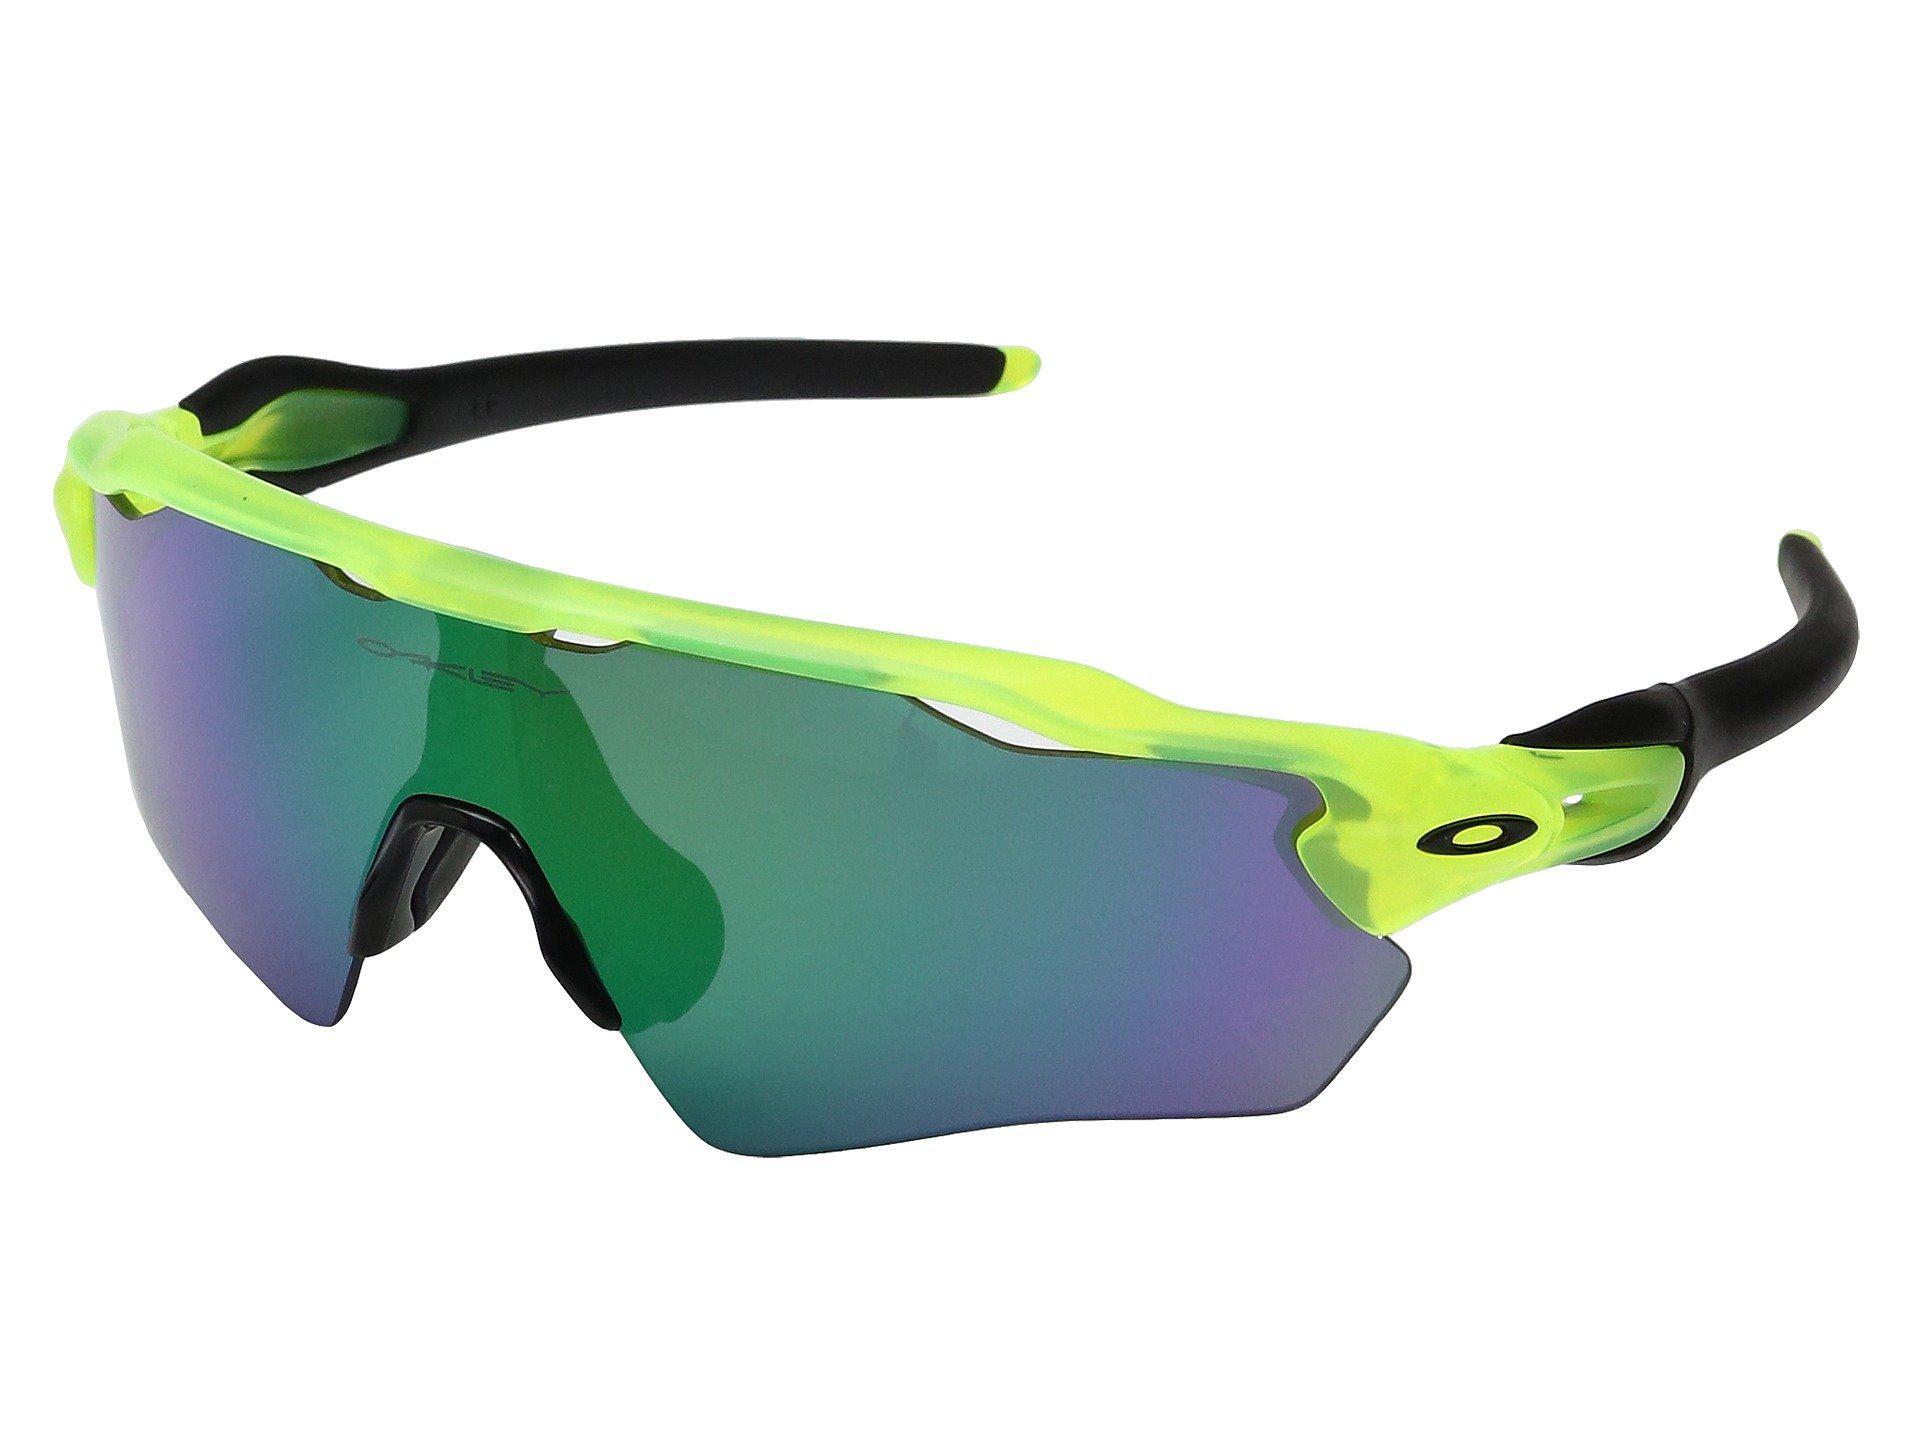 3db1f661c0 Oakley. Men s Green Radar Ev Xs Path (youth Fit) (polished Black W  Black  Iridium Polarized) Fashion Sunglasses